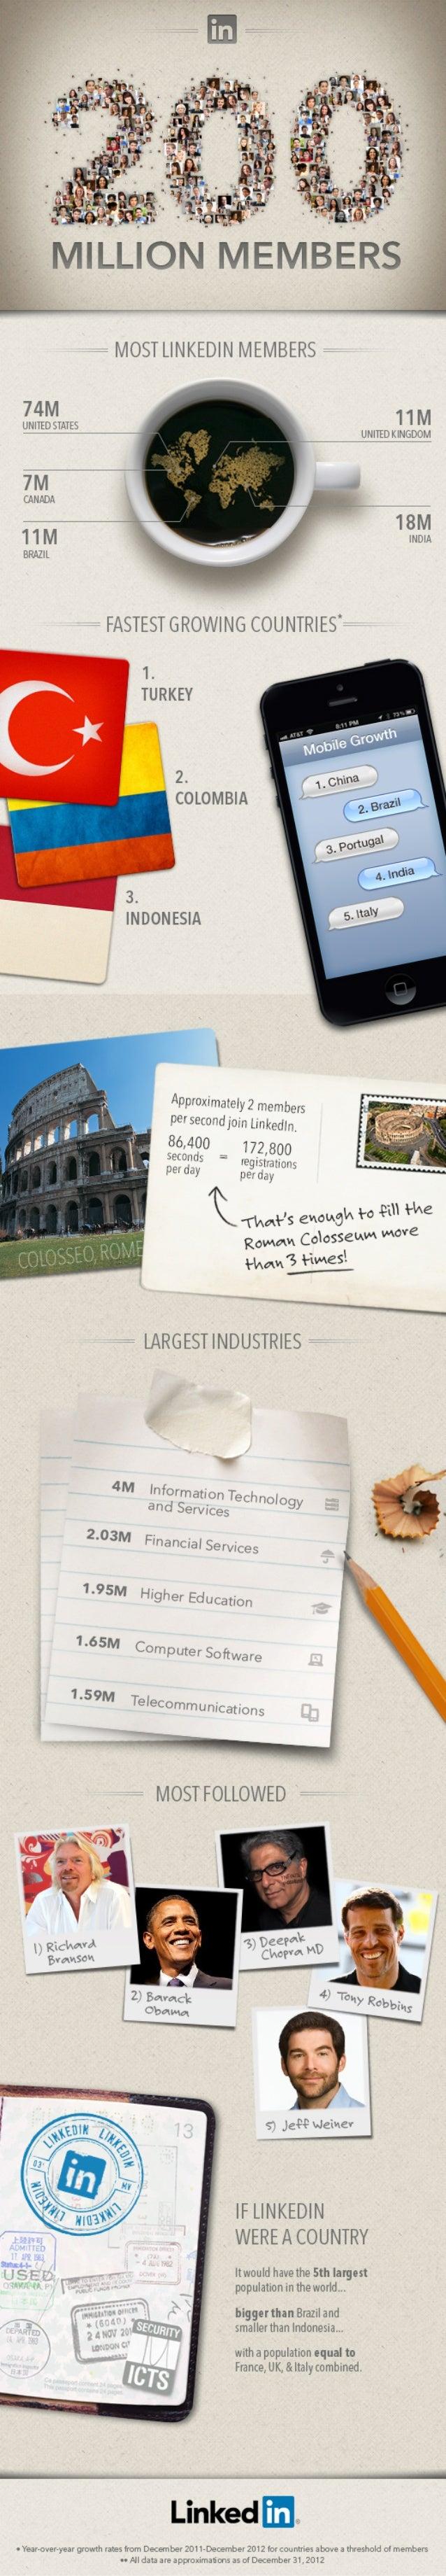 LinkedIn 200 Million Member Milestone